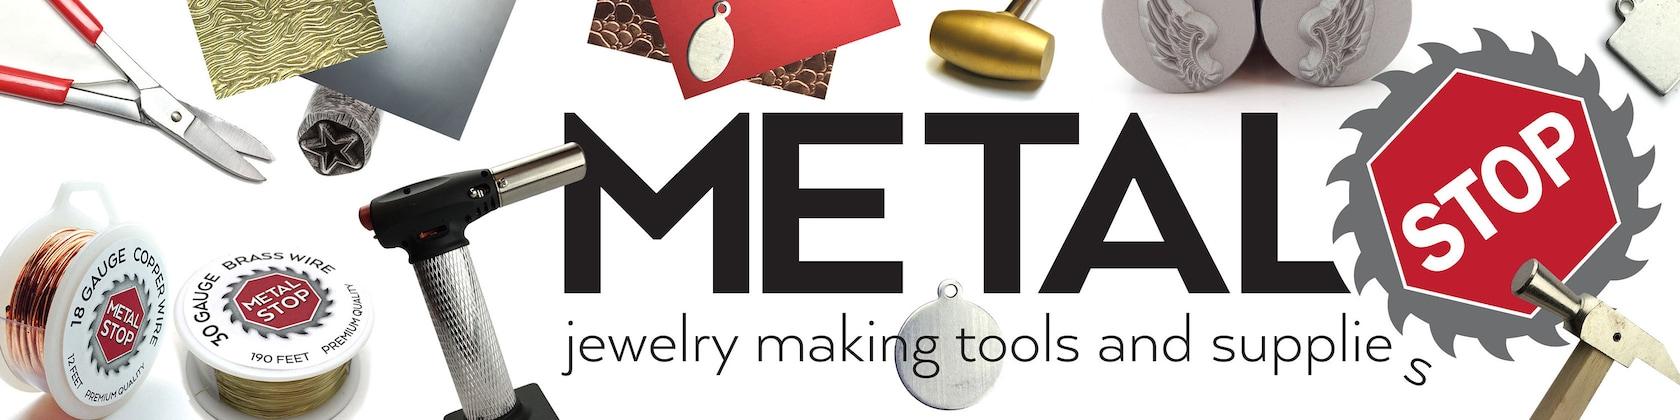 Jewelry Making Tools and Supplies von metalstop auf Etsy